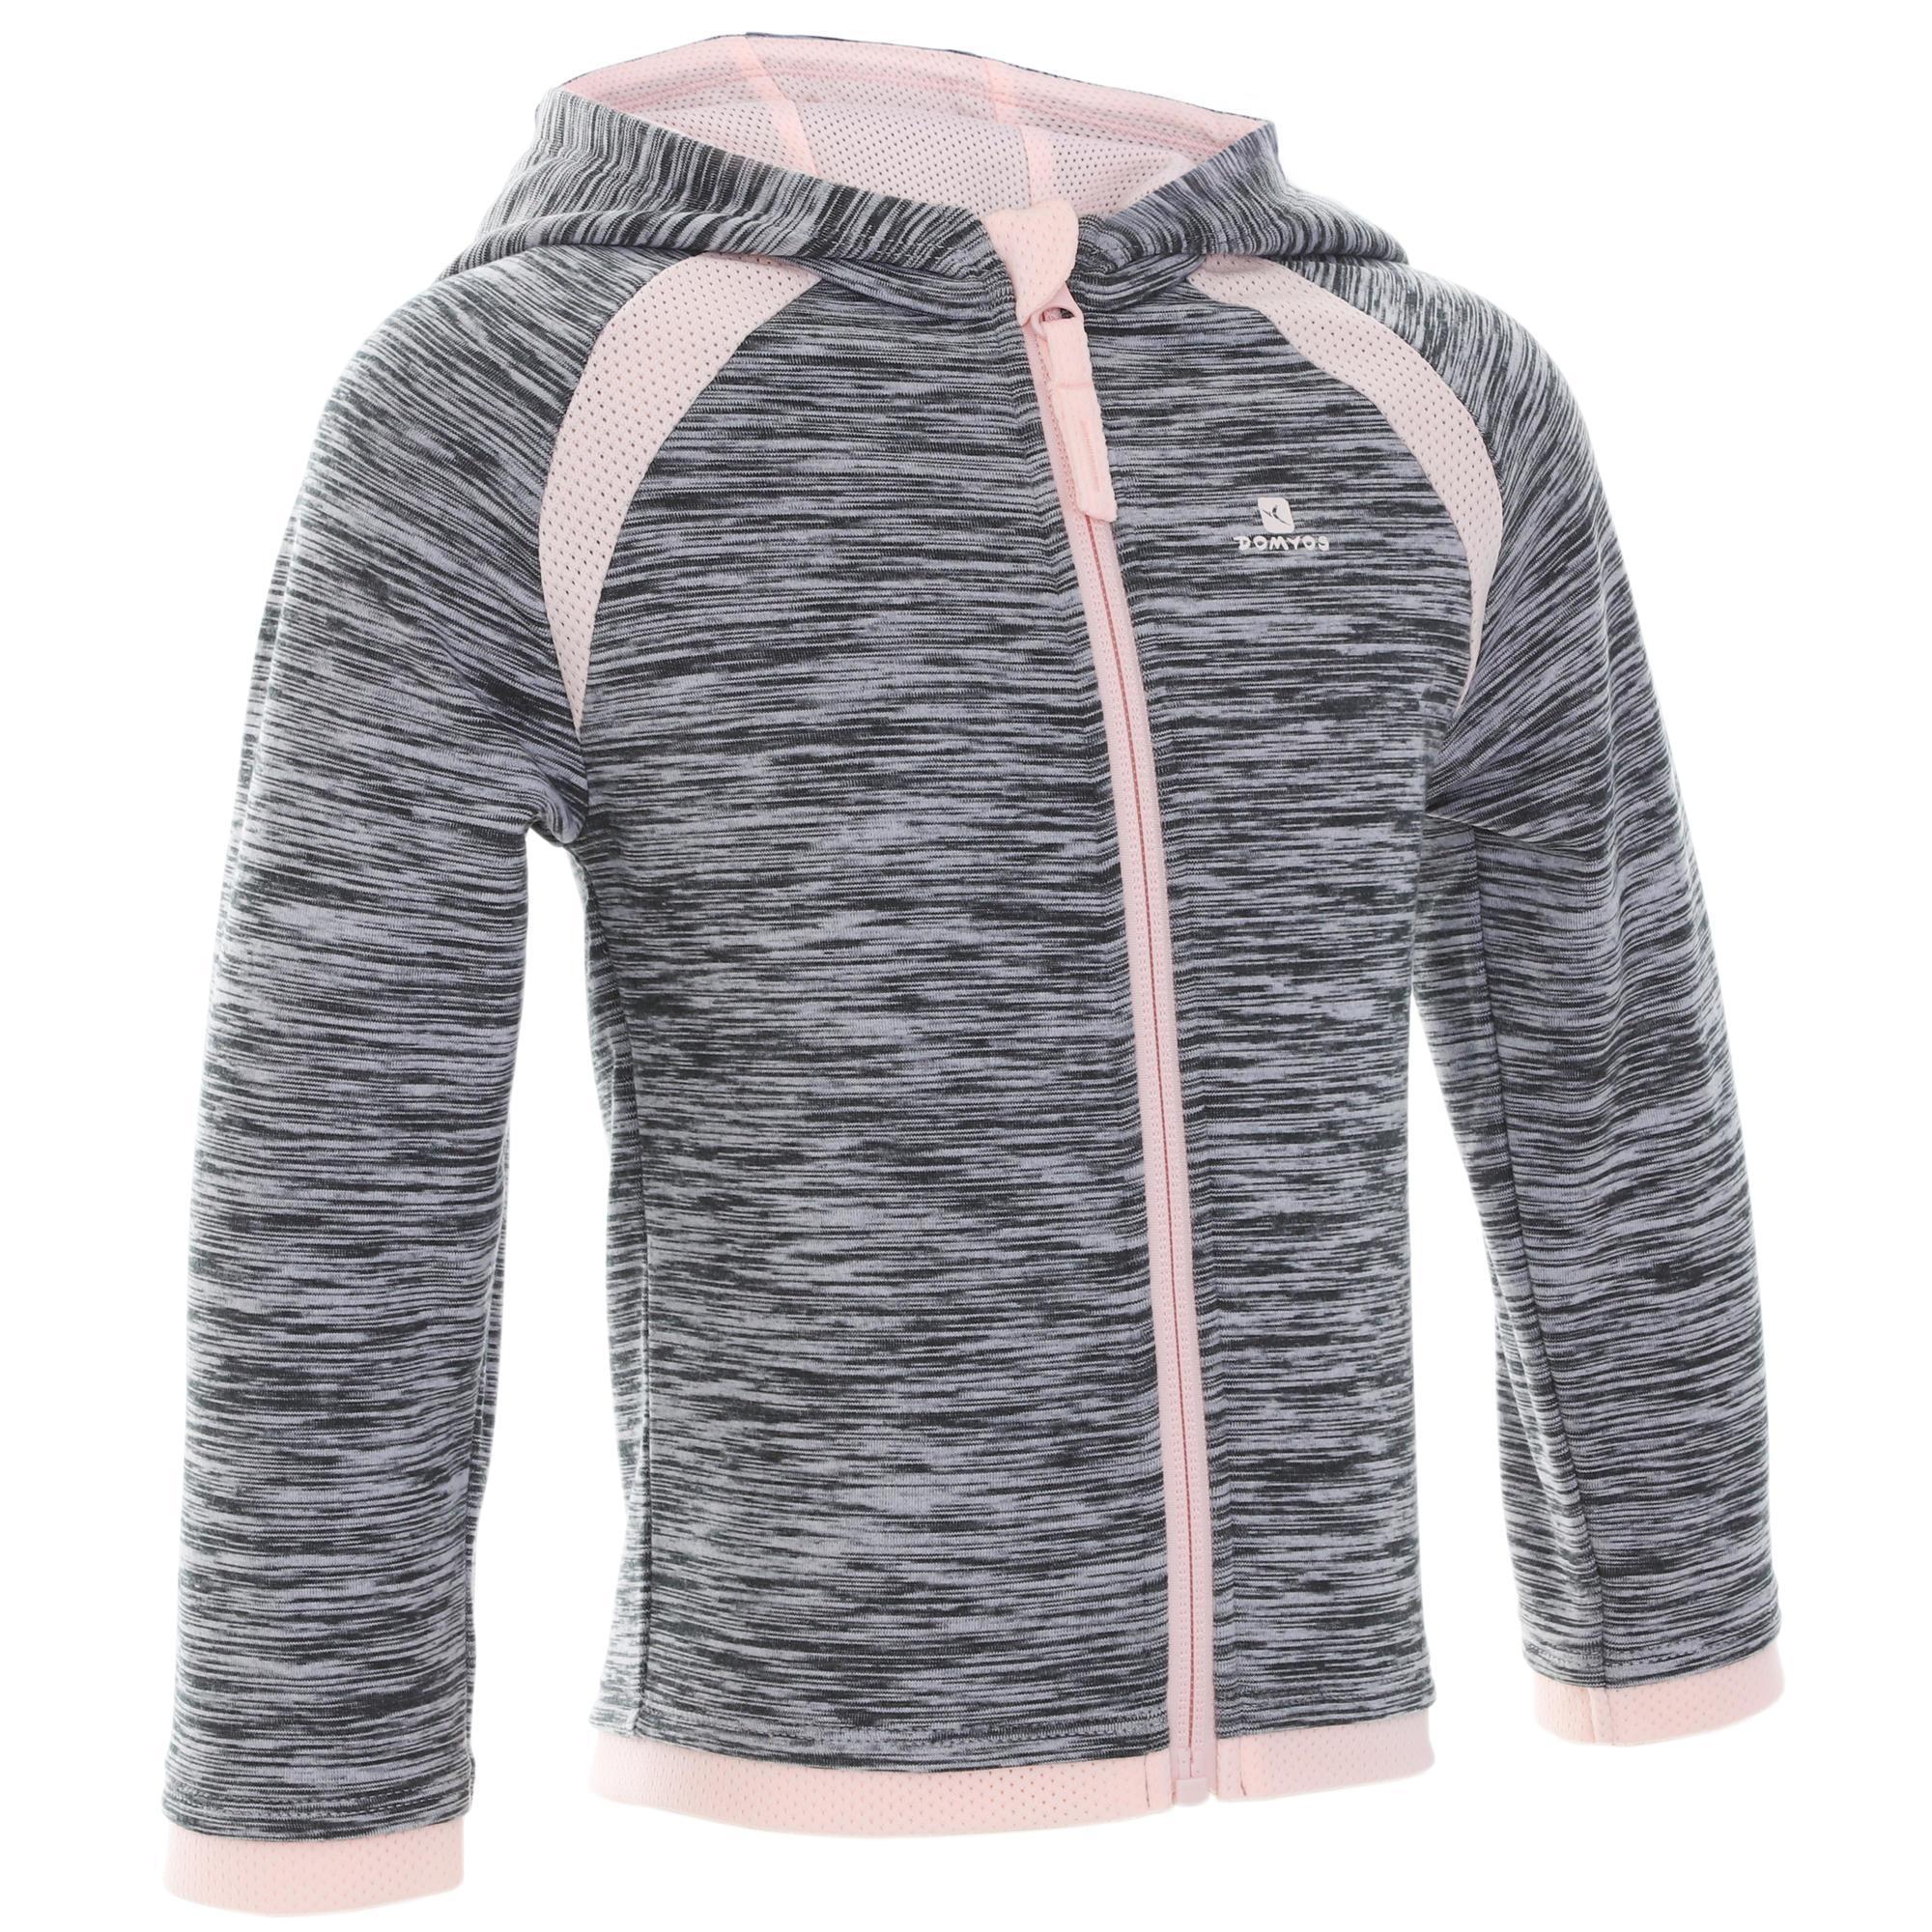 5be2d60fa425 Clothing - Decathlon